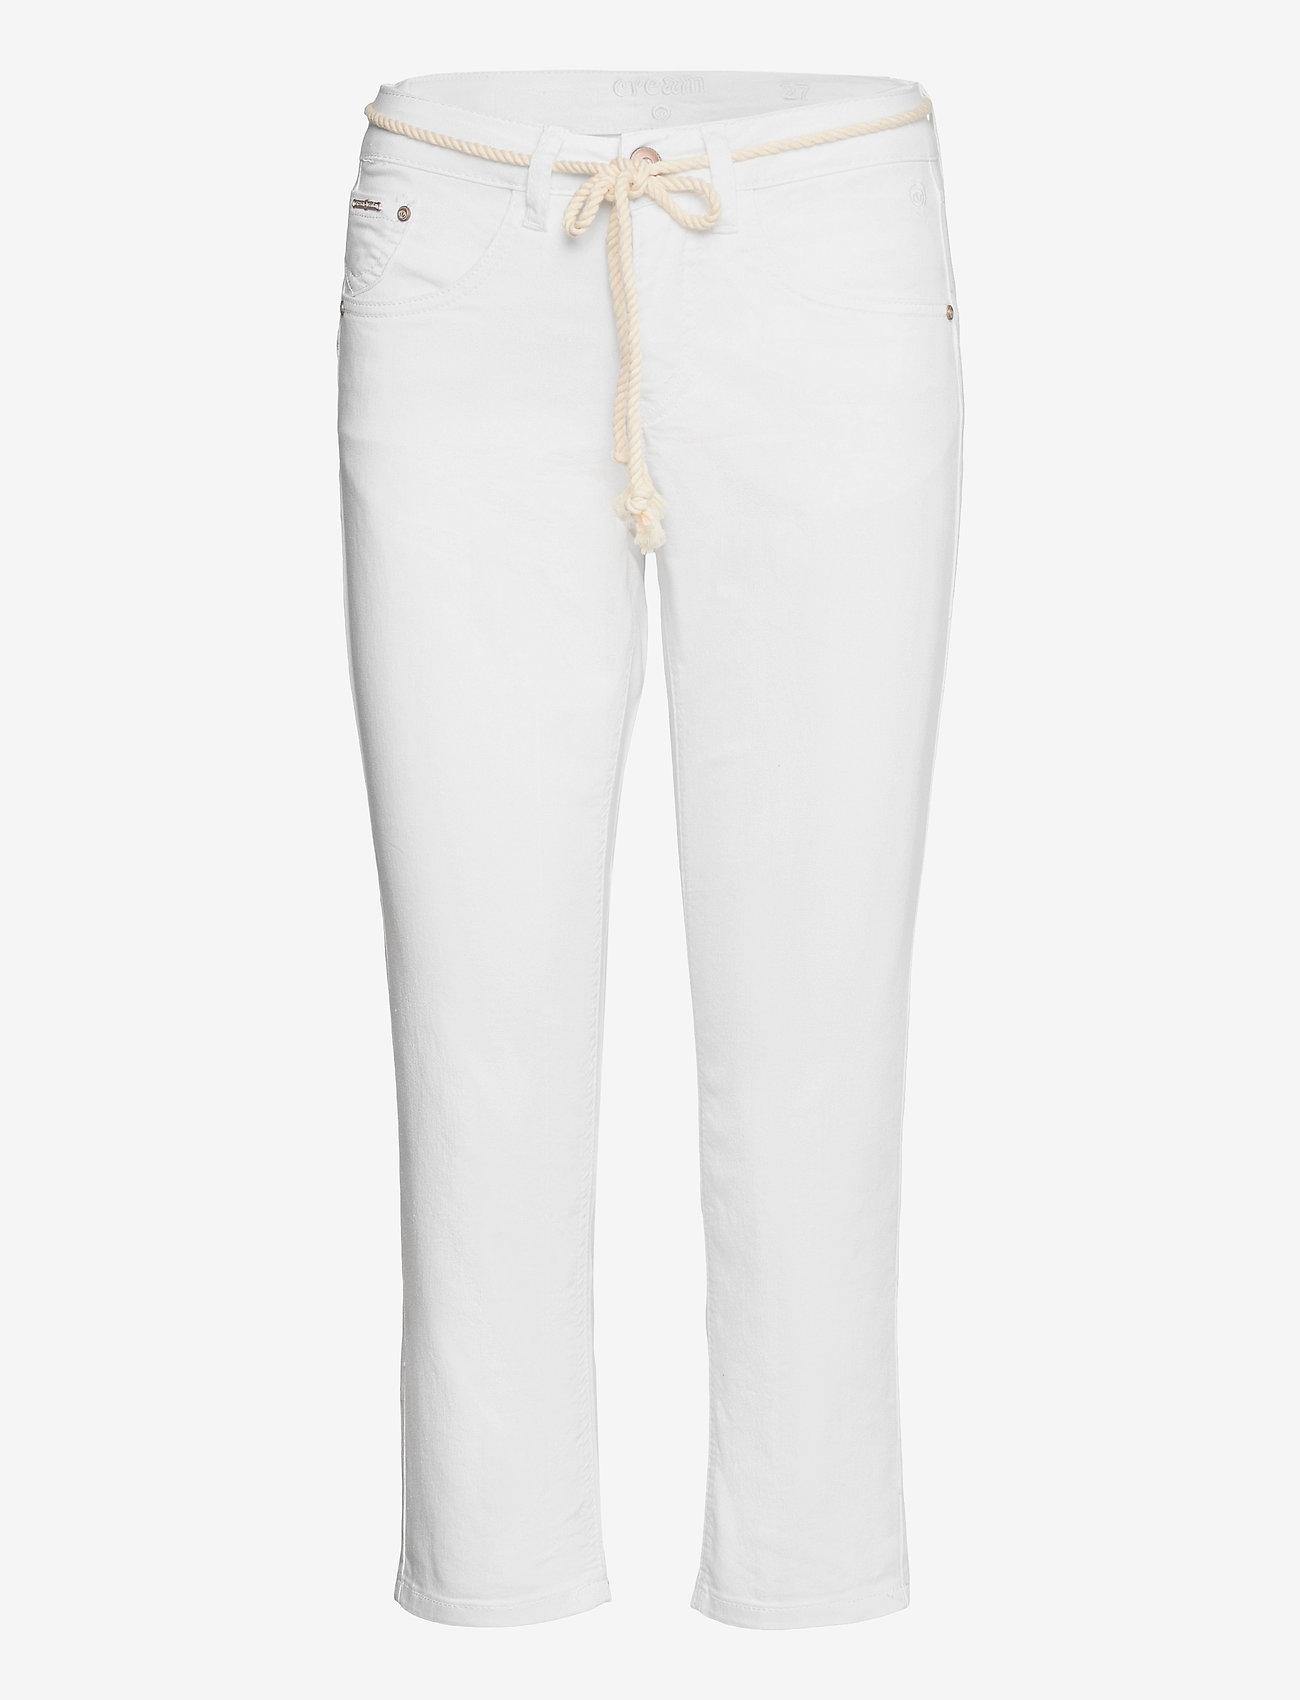 Cream - CRVava Pant 3/4 - Coco Fit - straight regular - snow white - 0